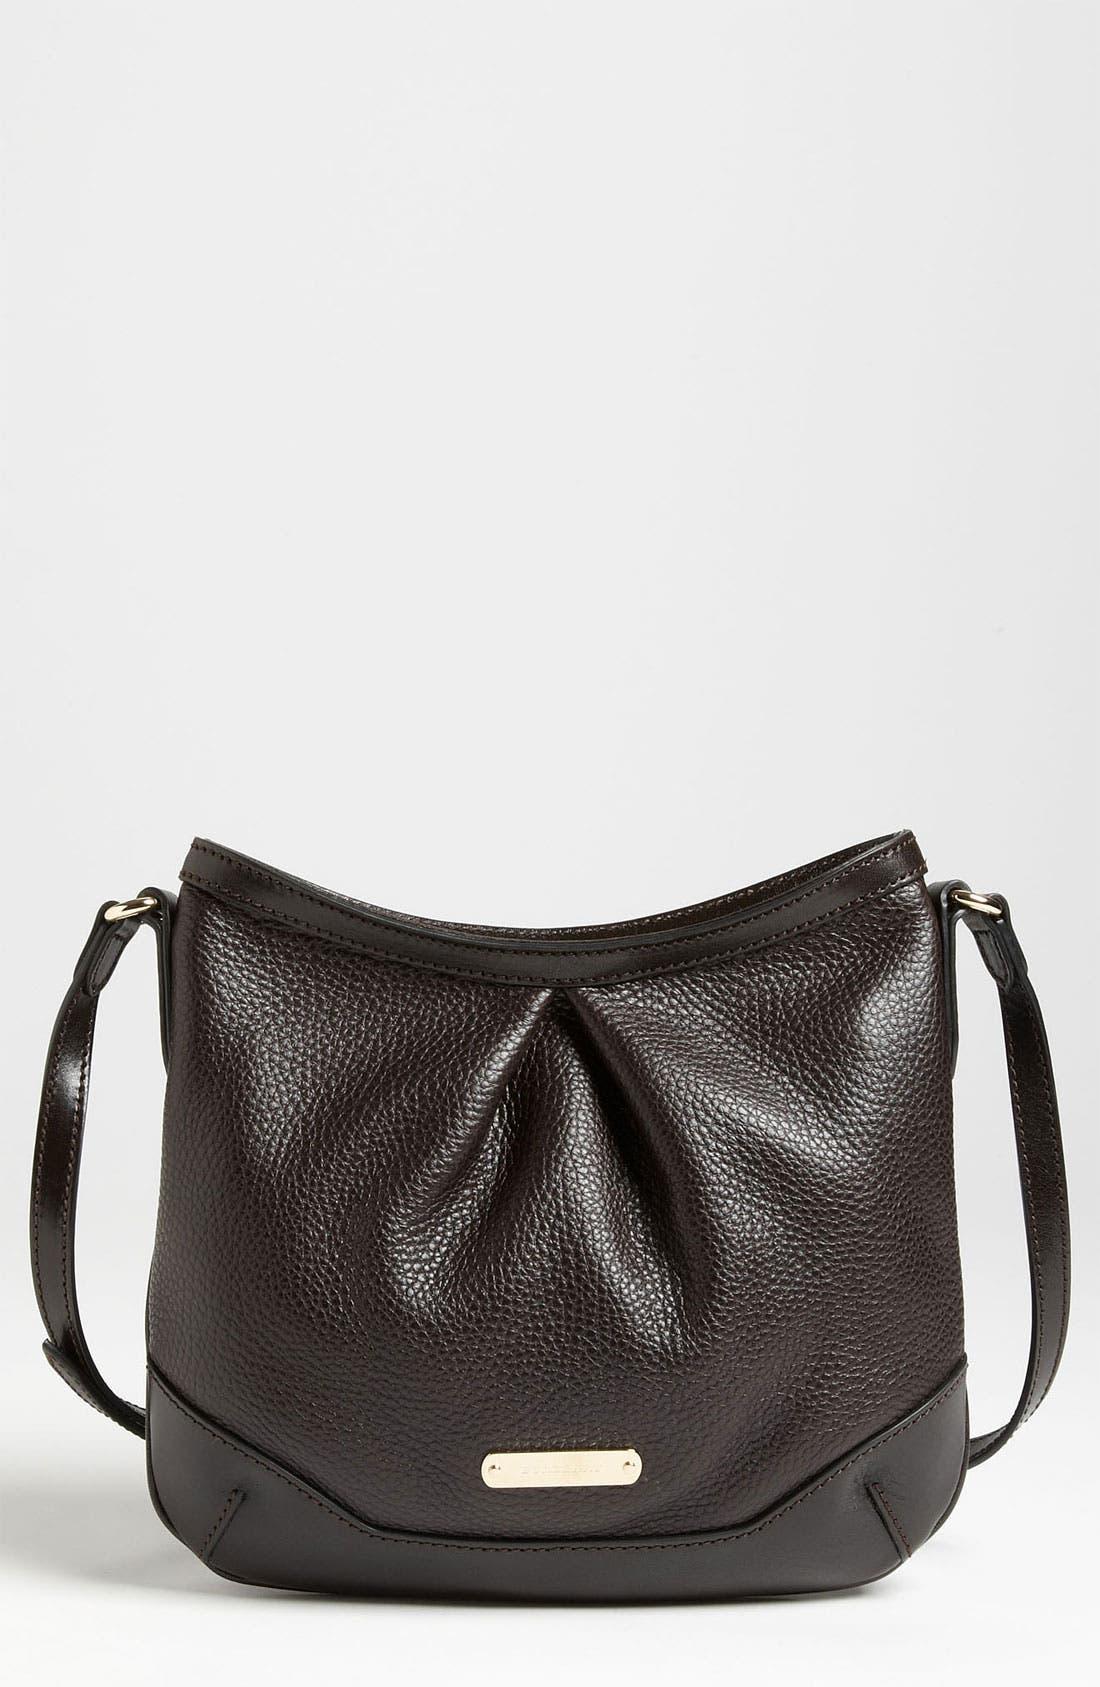 Main Image - Burberry 'London Grainy' Leather Crossbody Bag